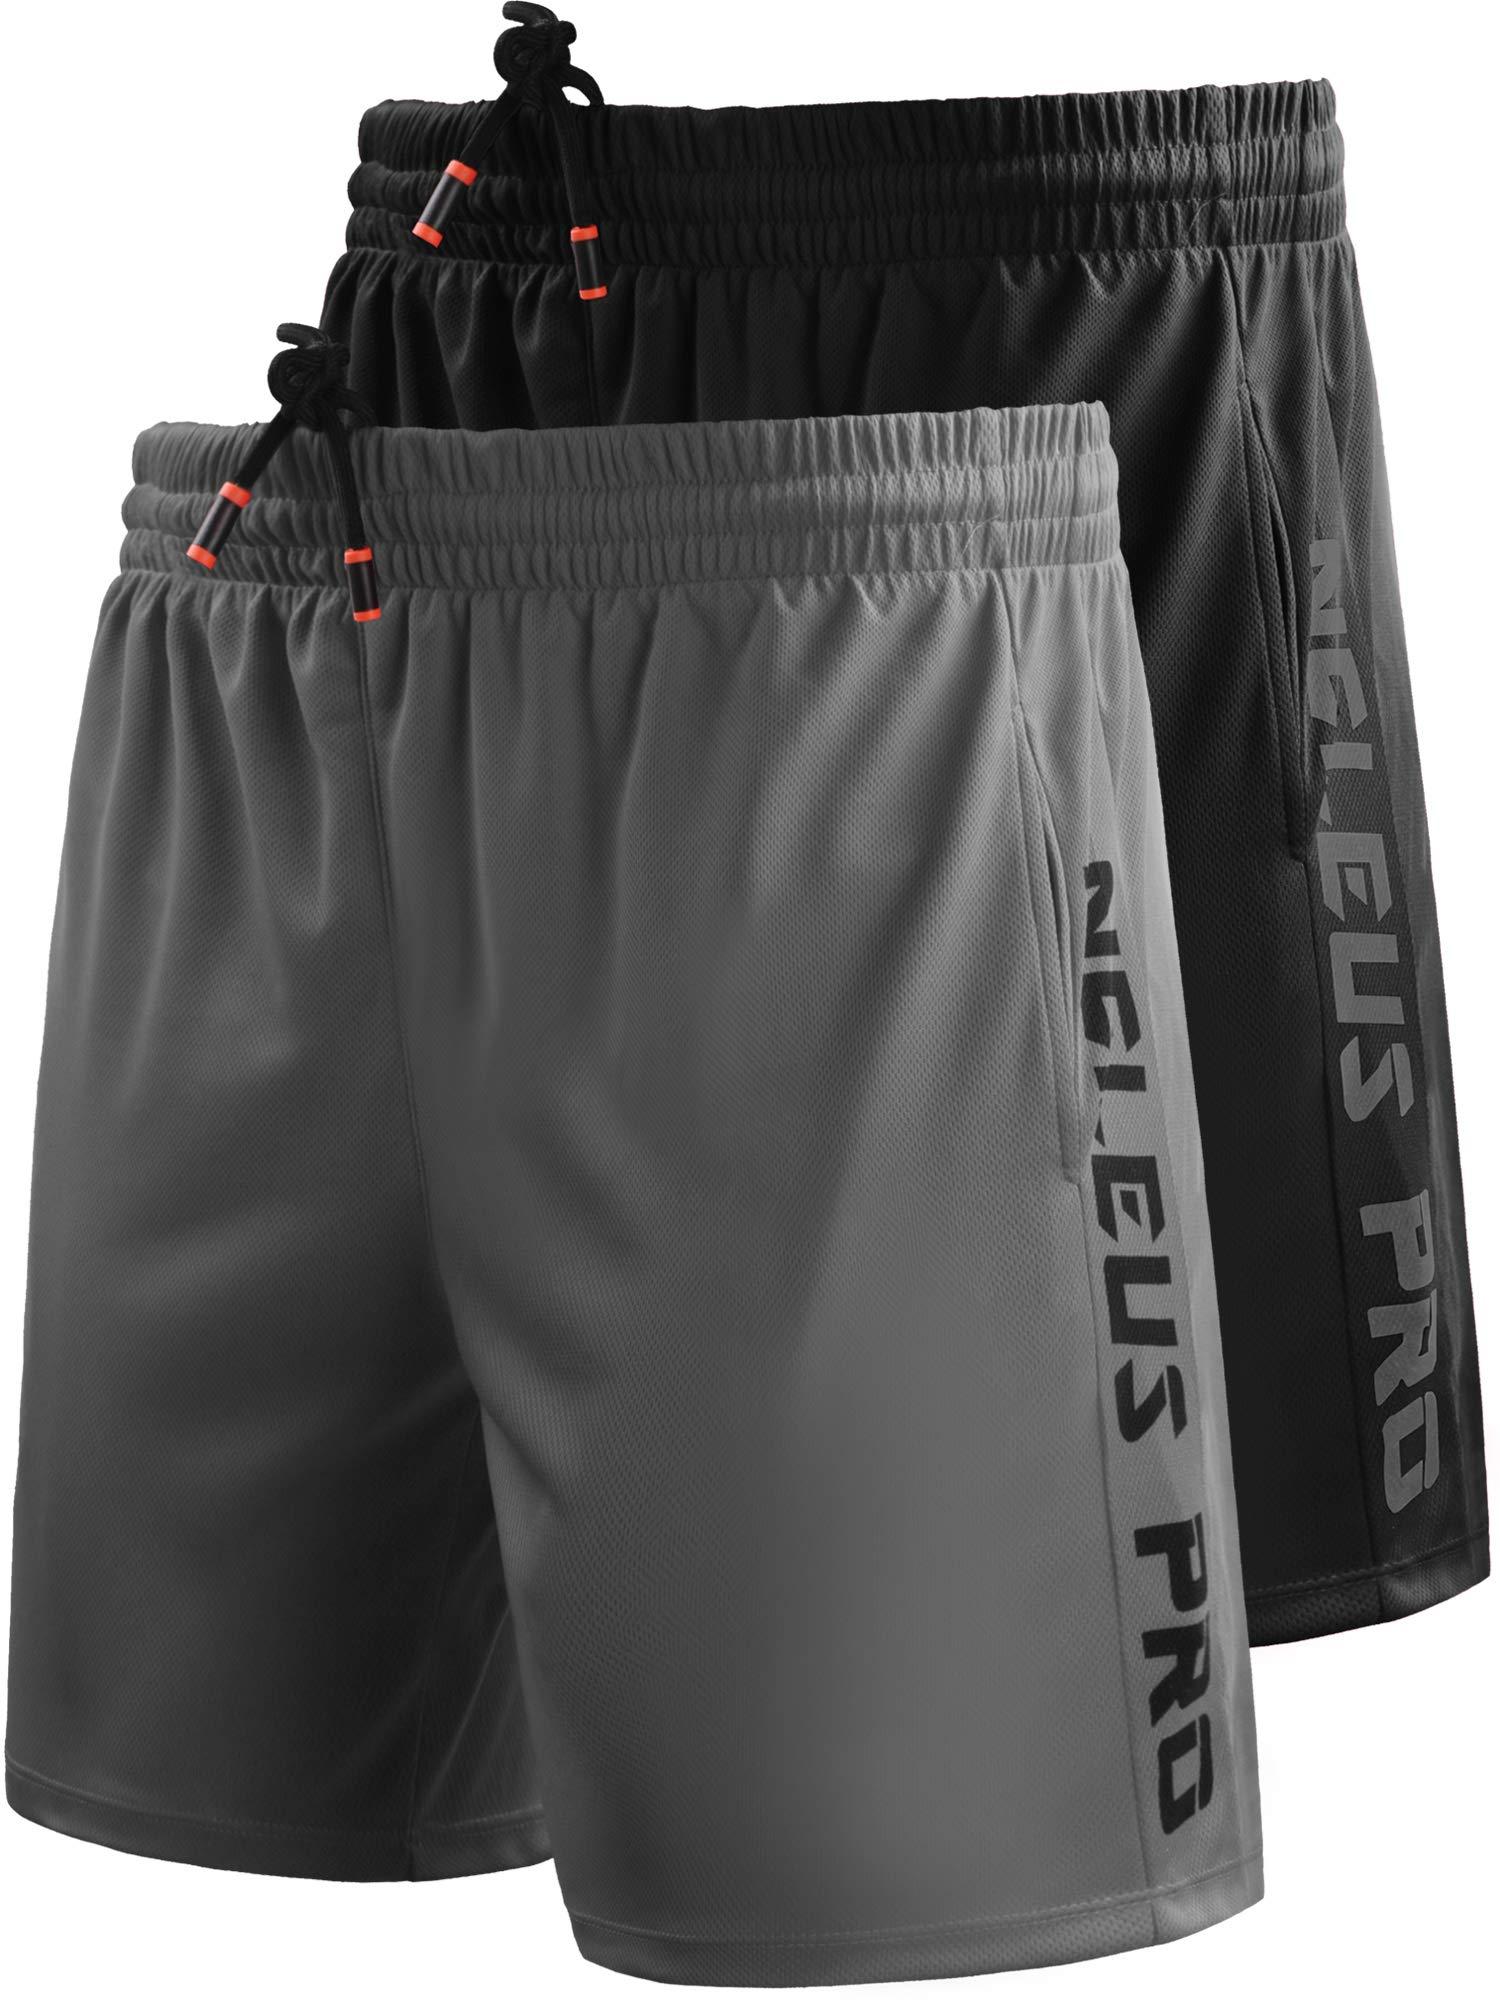 Neleus Men's 7'' Workout Running Shorts with Pockets,6056,2 Pack,Black,Grey,US L,EU XL by Neleus